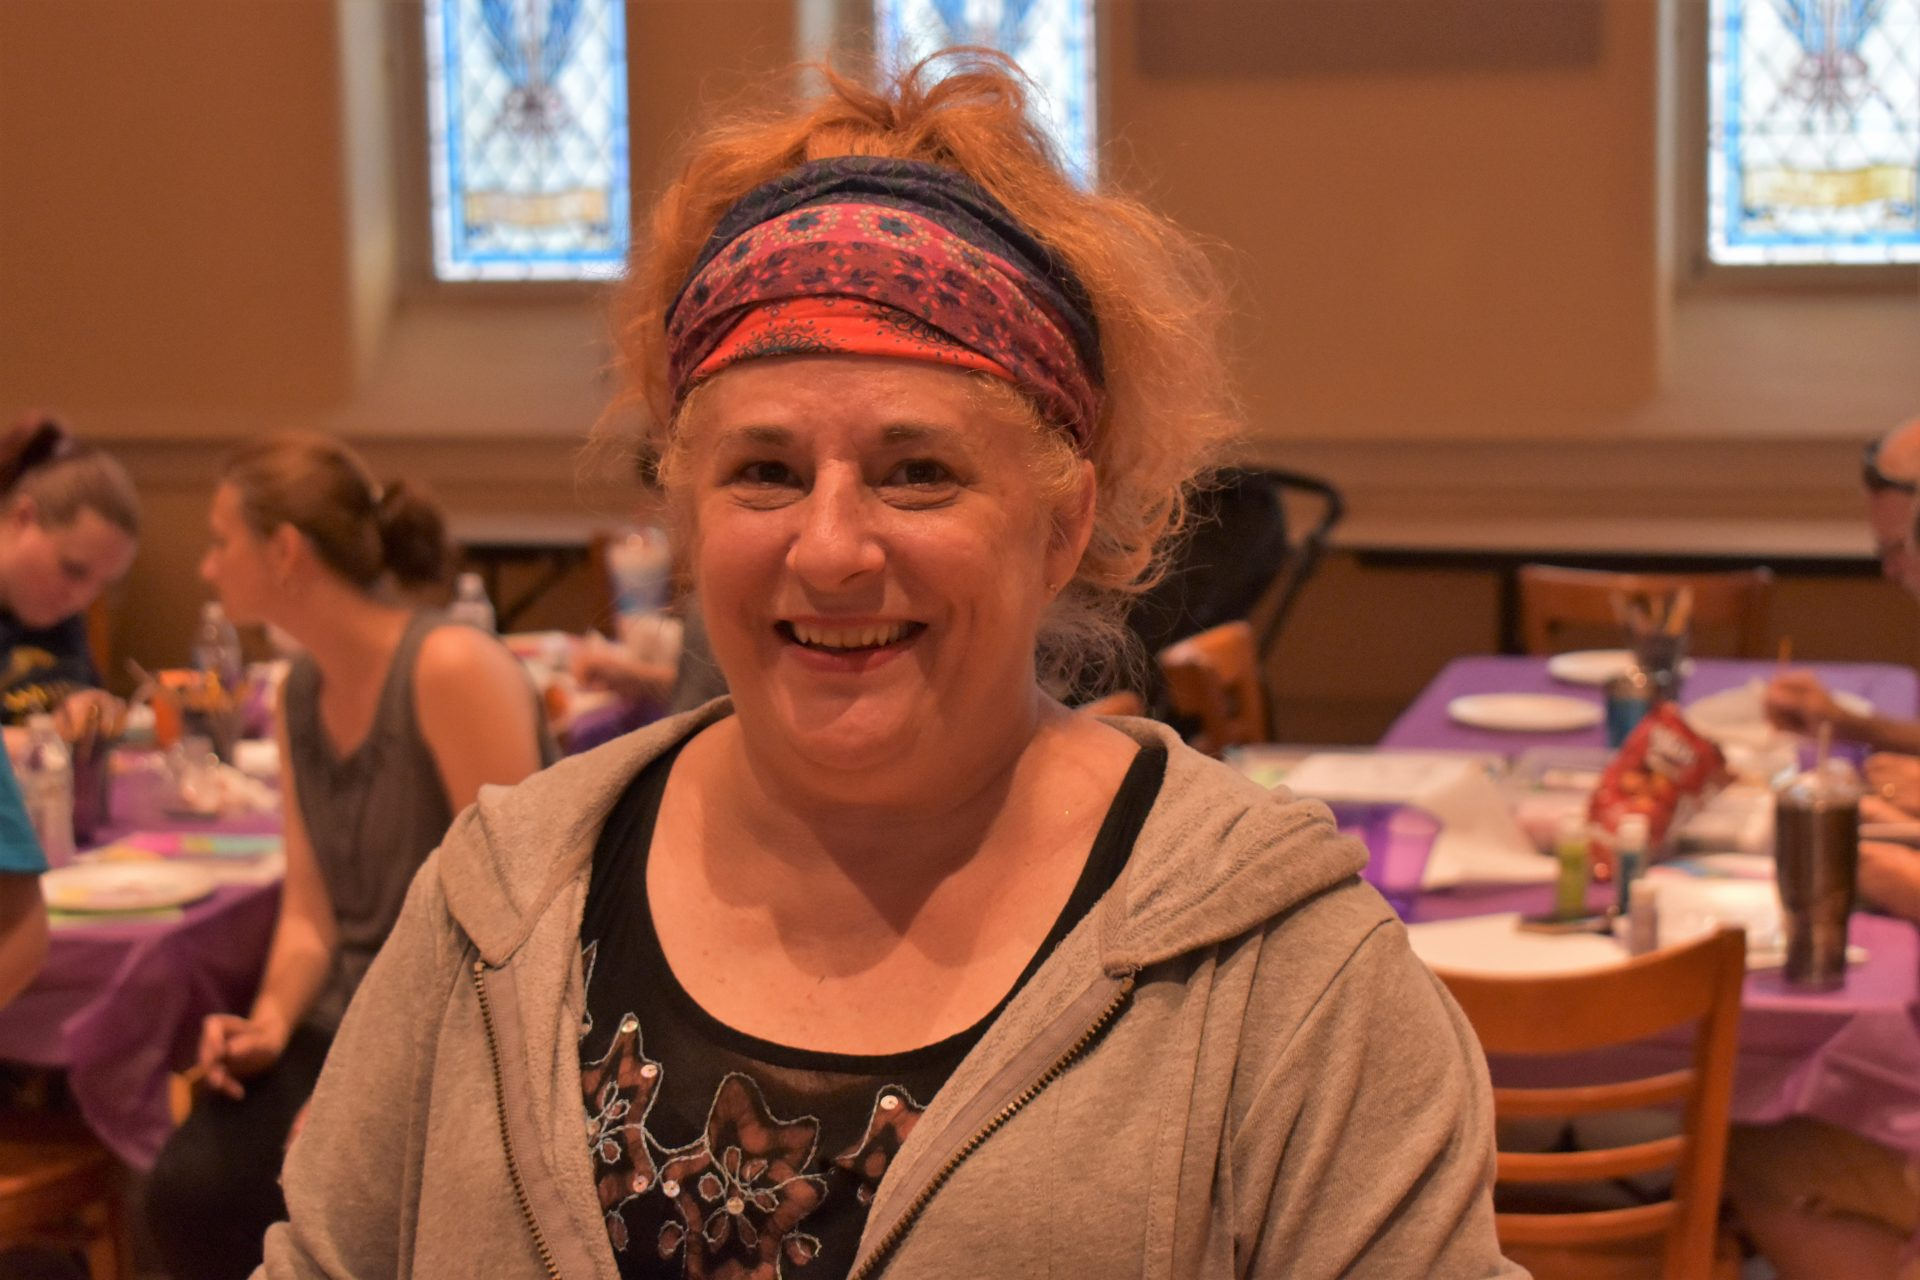 Amy Mummert is seen inside Union Lutheran Church in York on June 12, 2019.